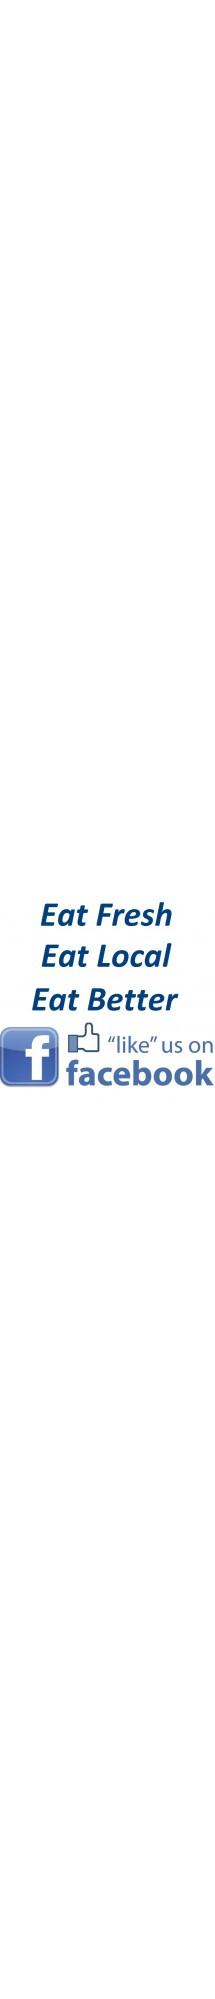 eat fresh eat local